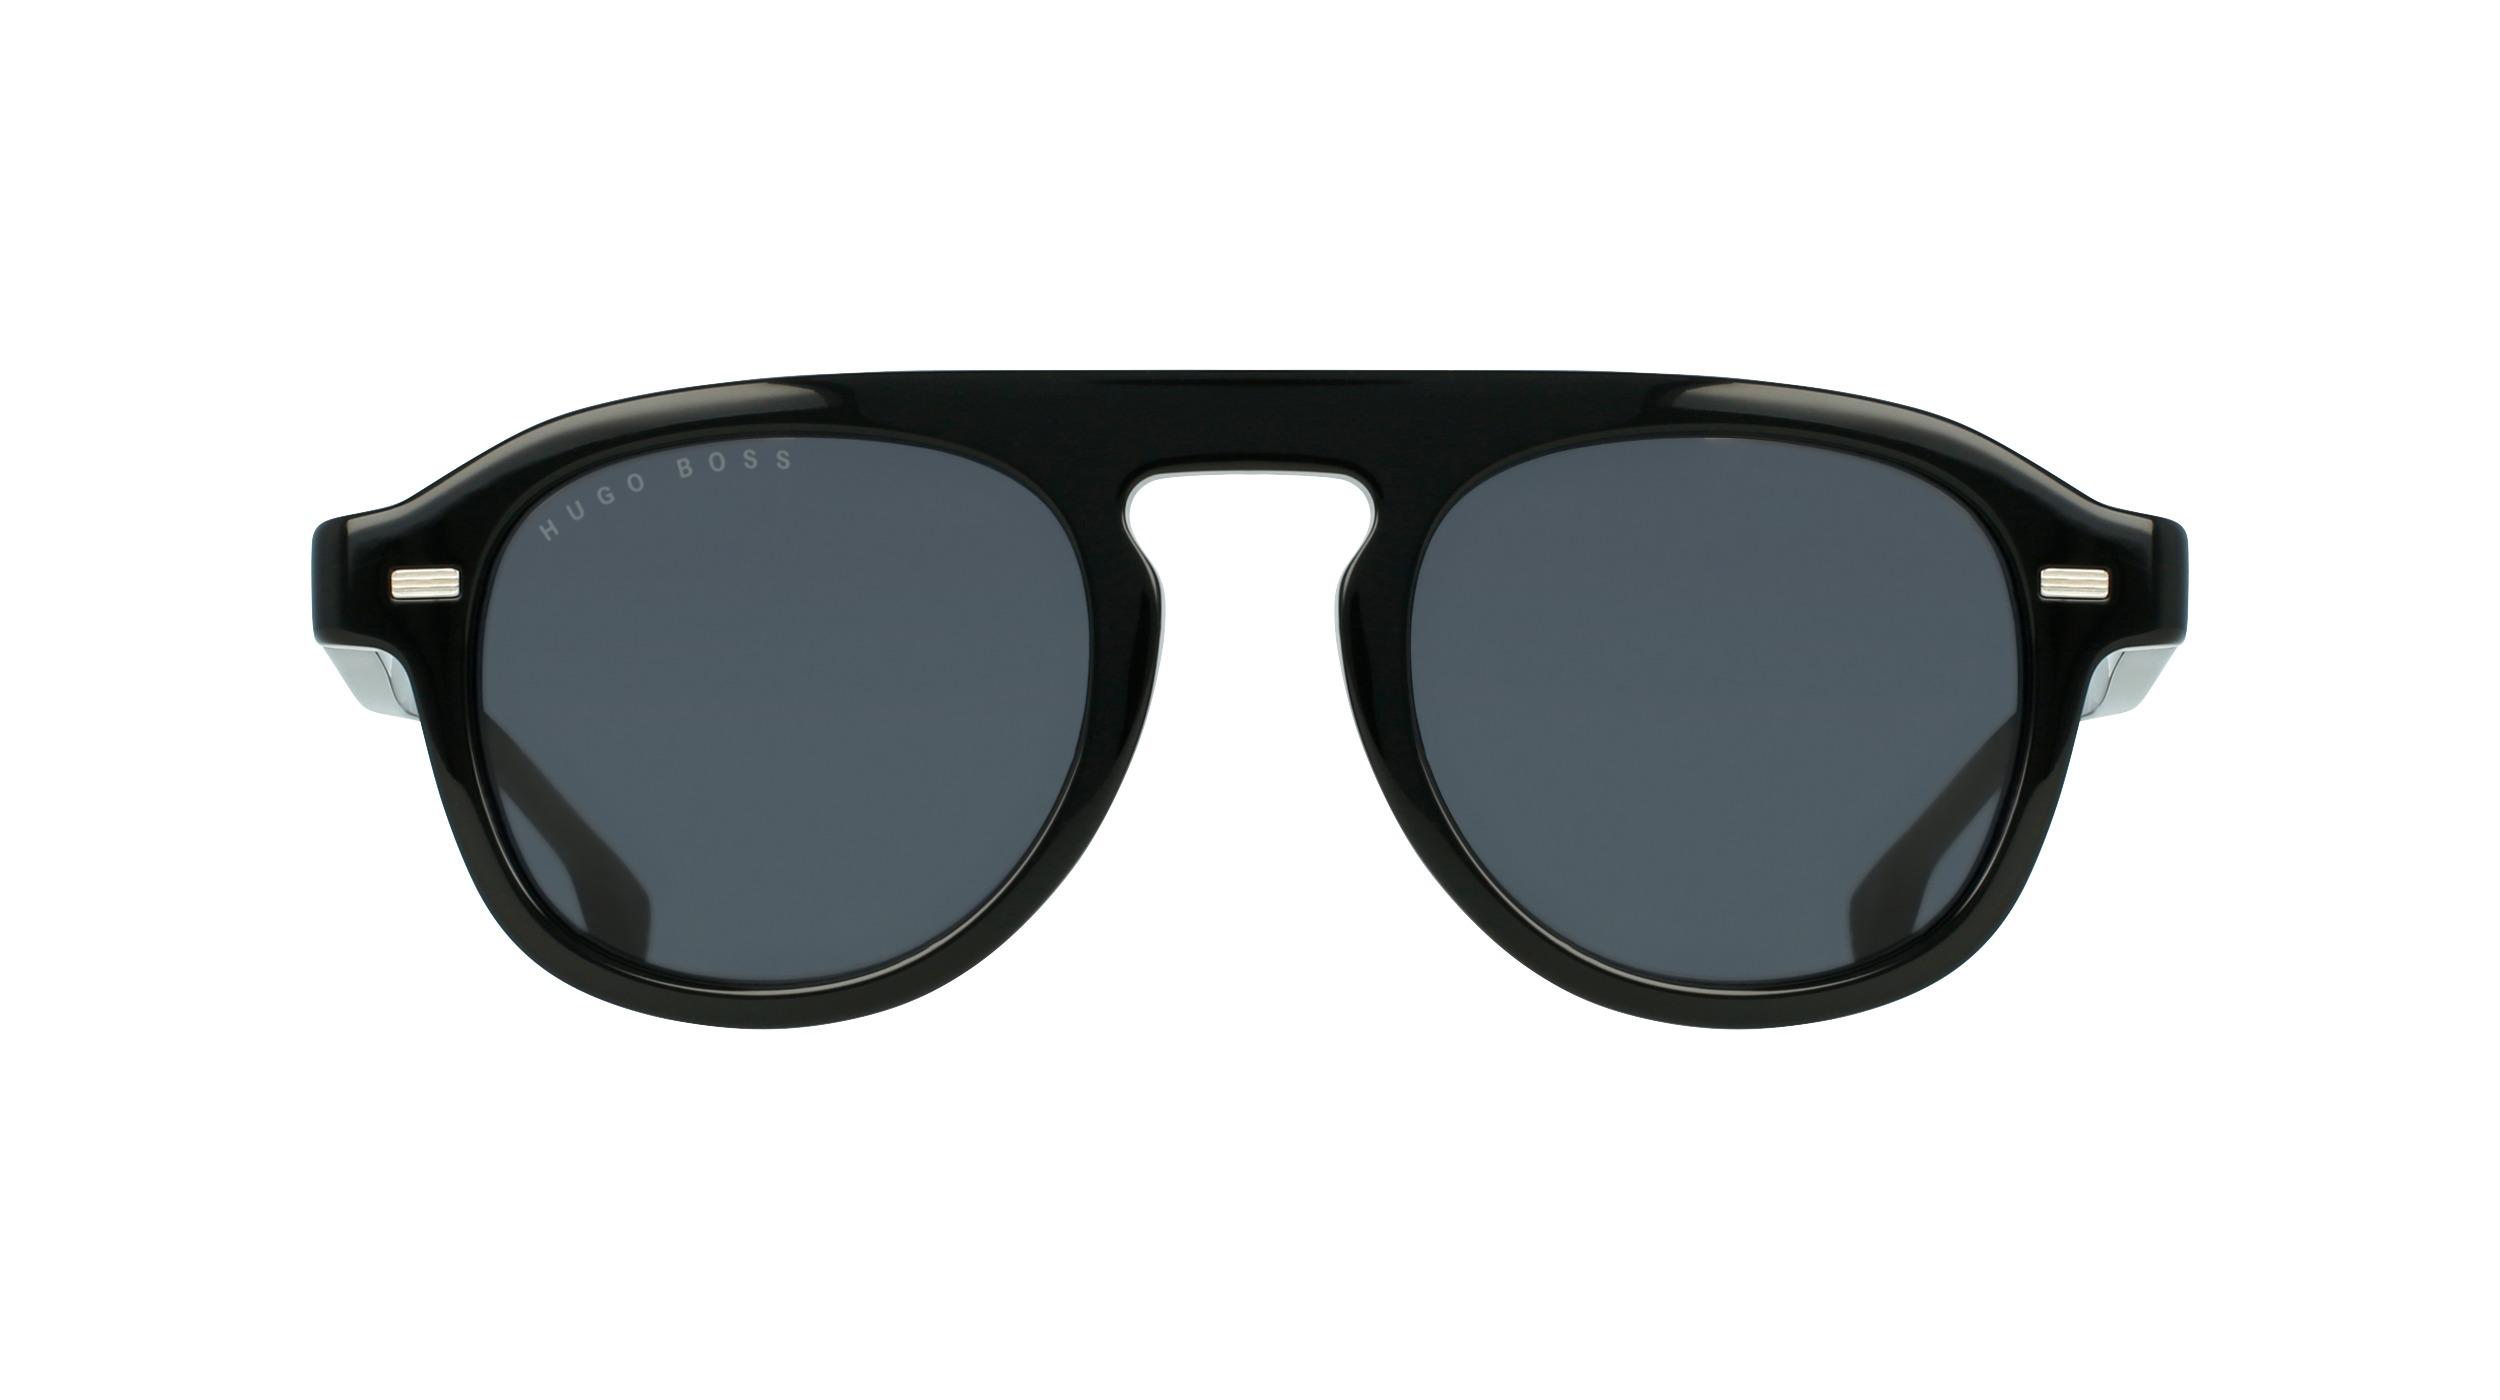 optic2000-lunettes-soleil-hugo-boss